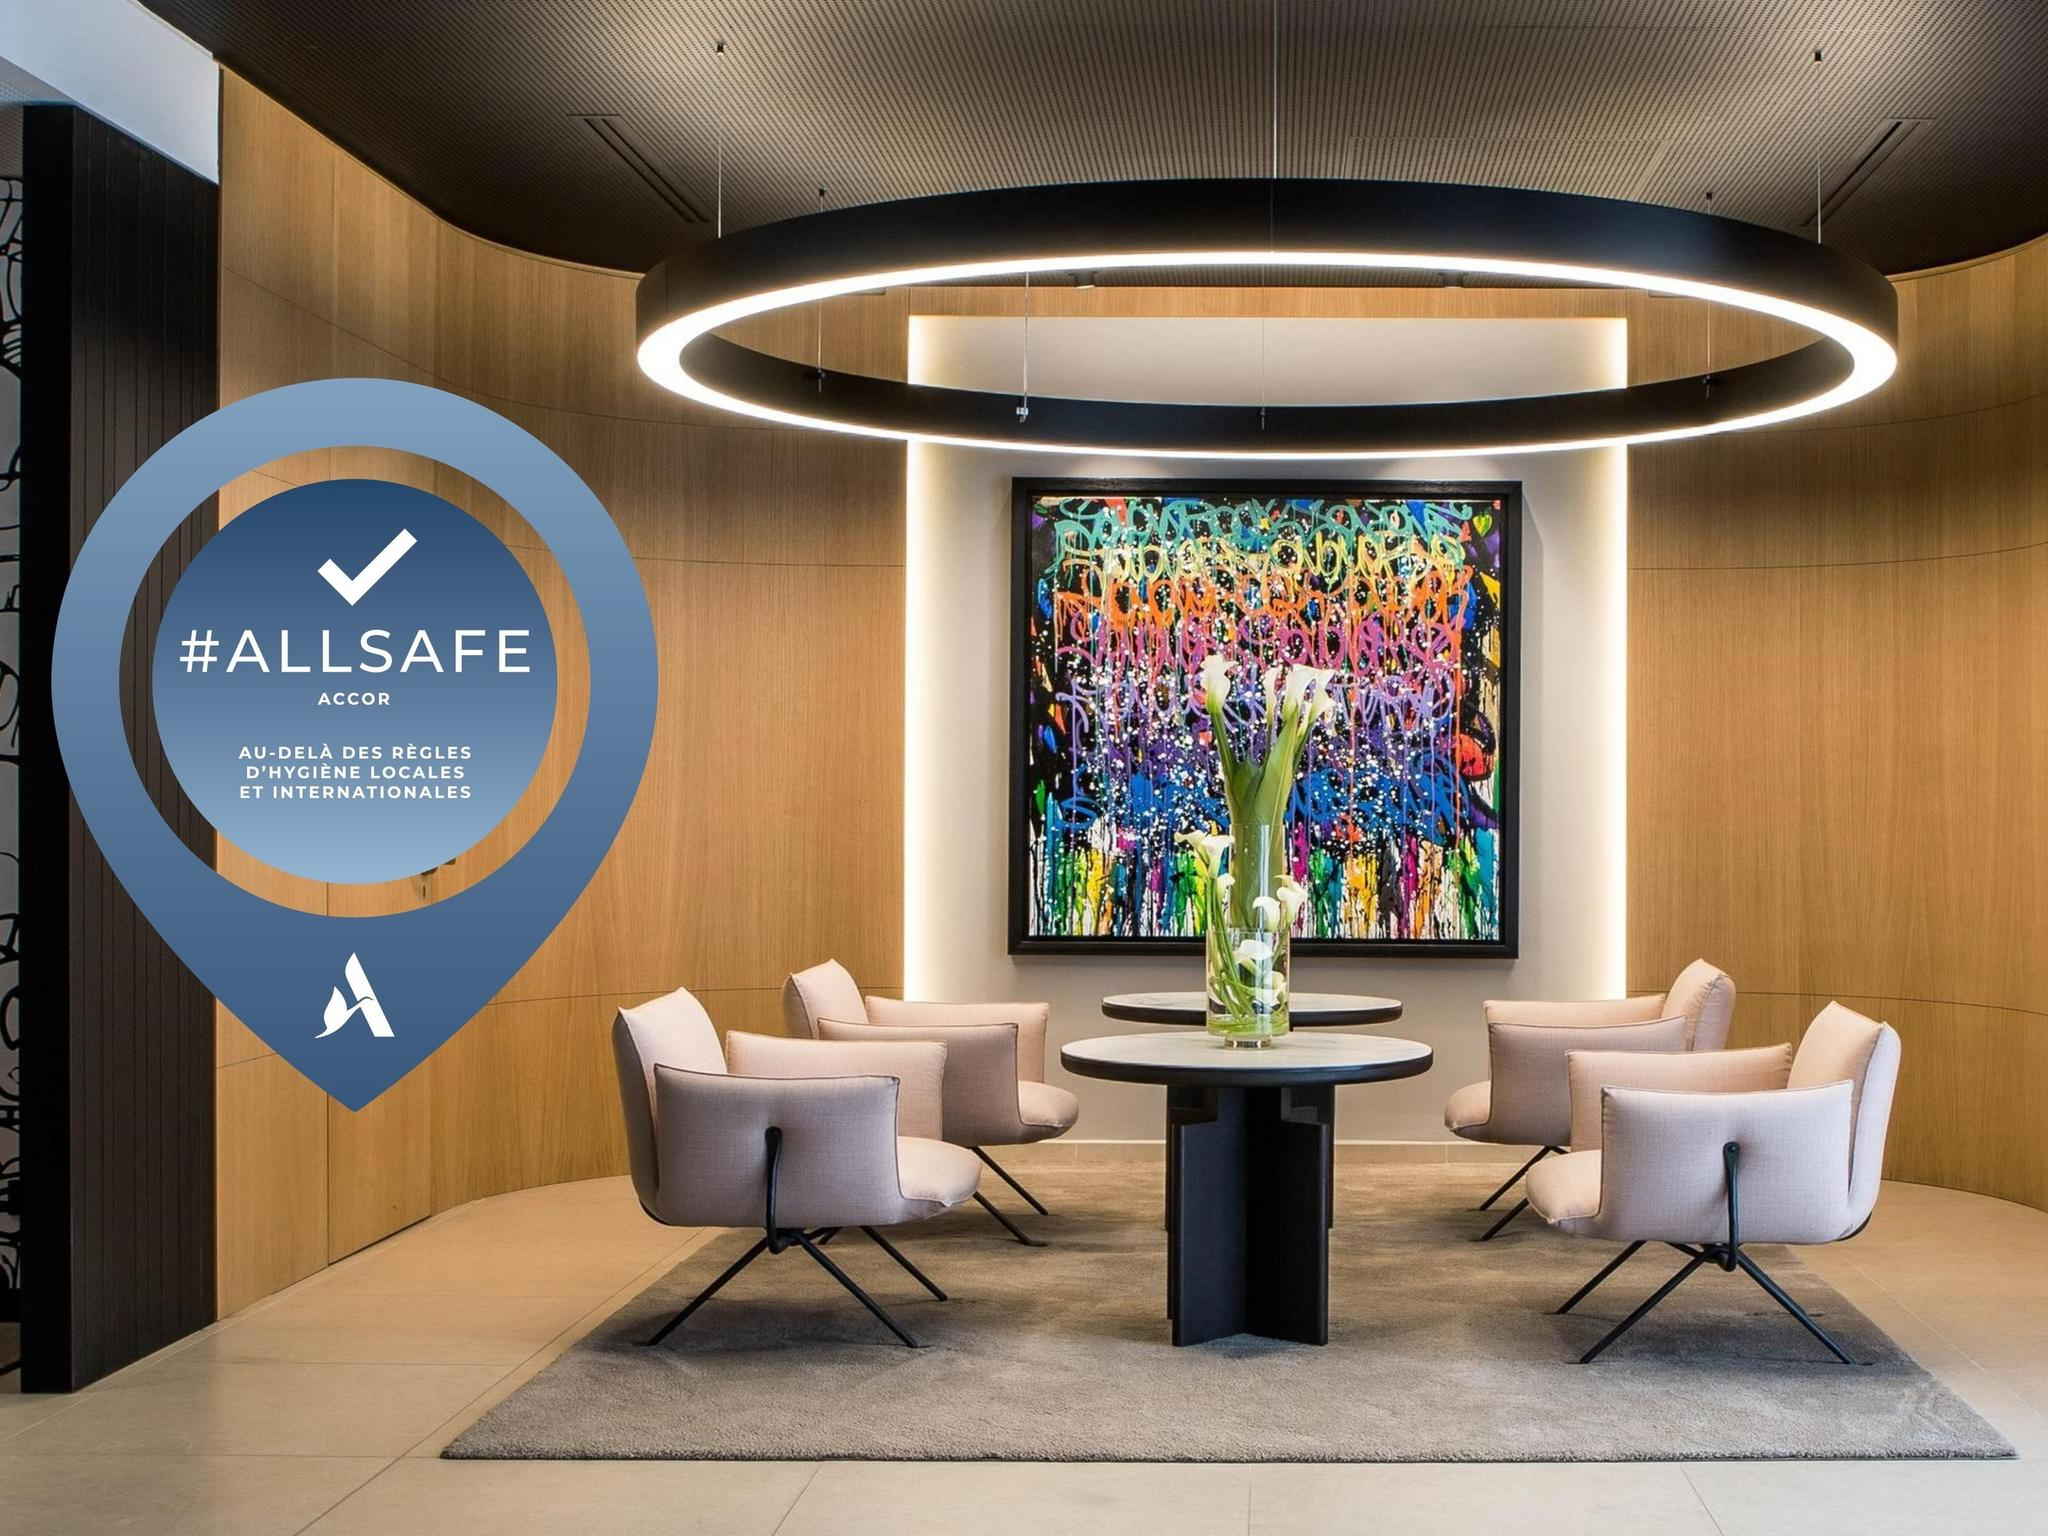 Hotel - Mercure Paris 17 Batignolles (opening May 2018)